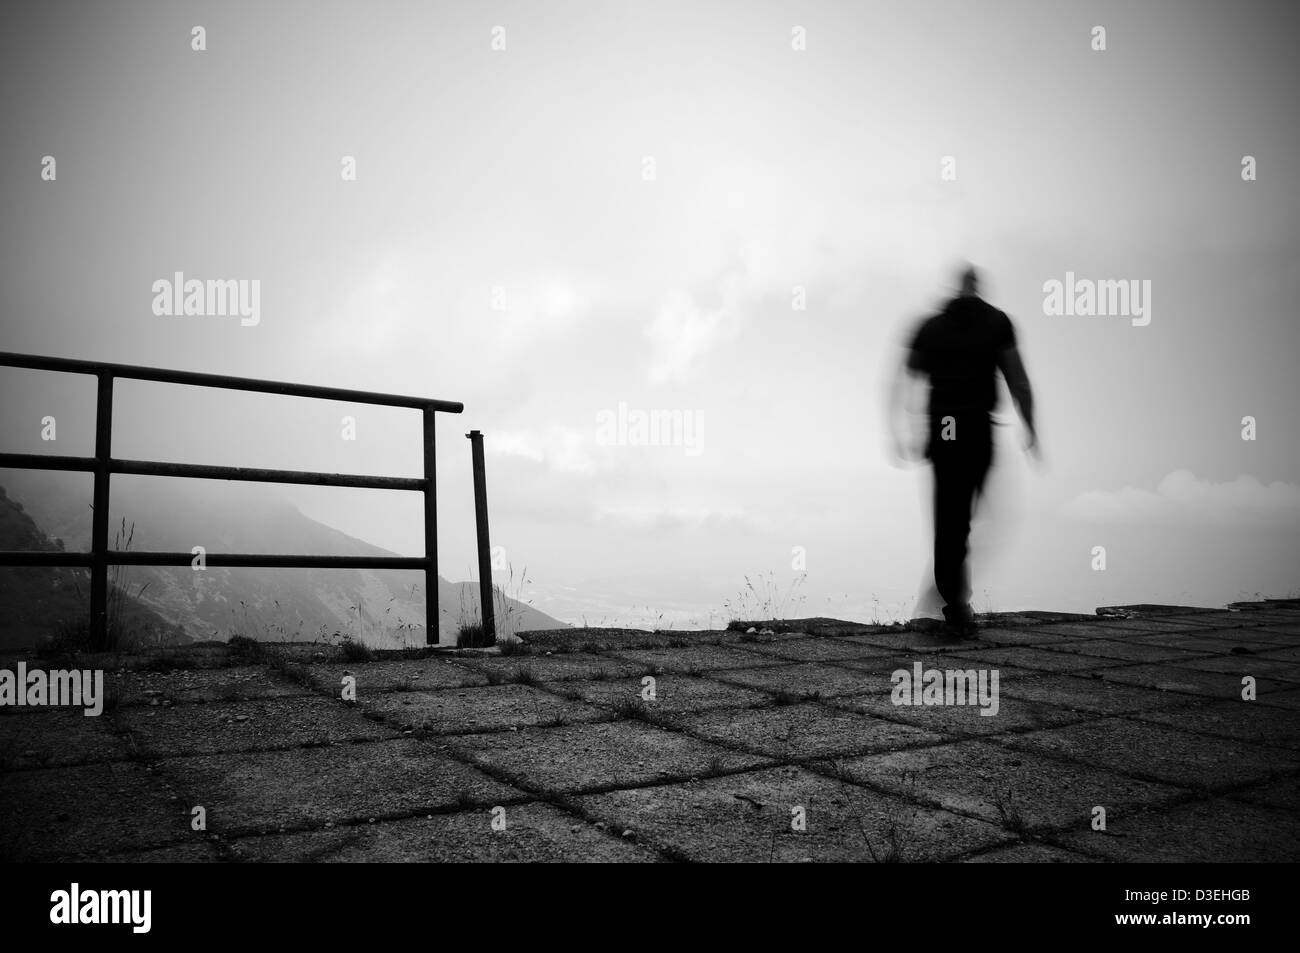 Mann springt ins Leere Stockbild